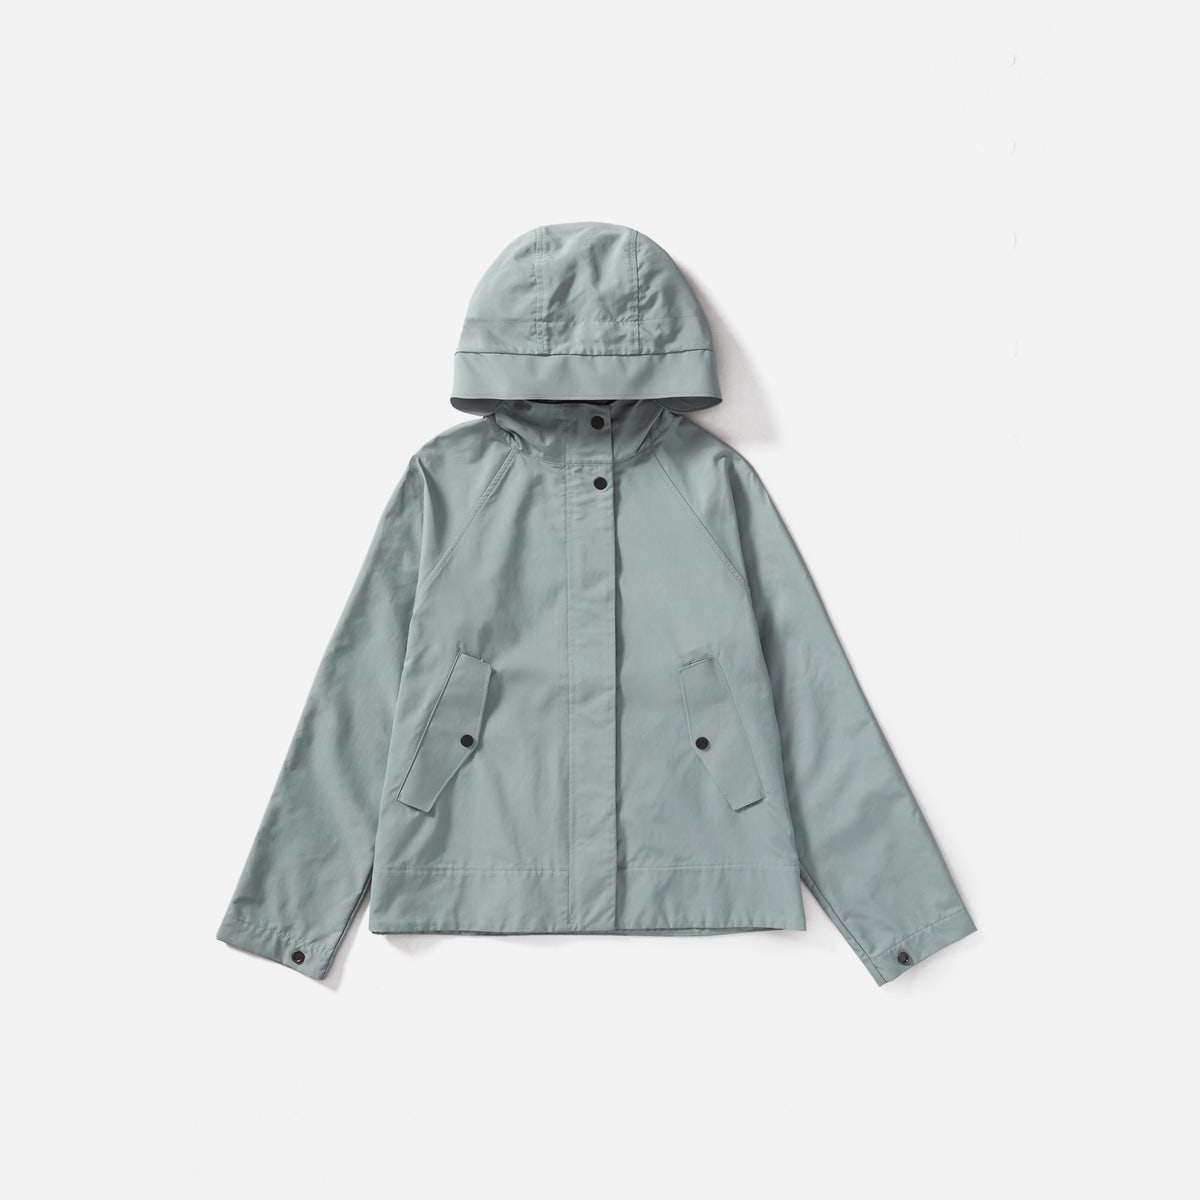 Cute Raincoats - Everlane